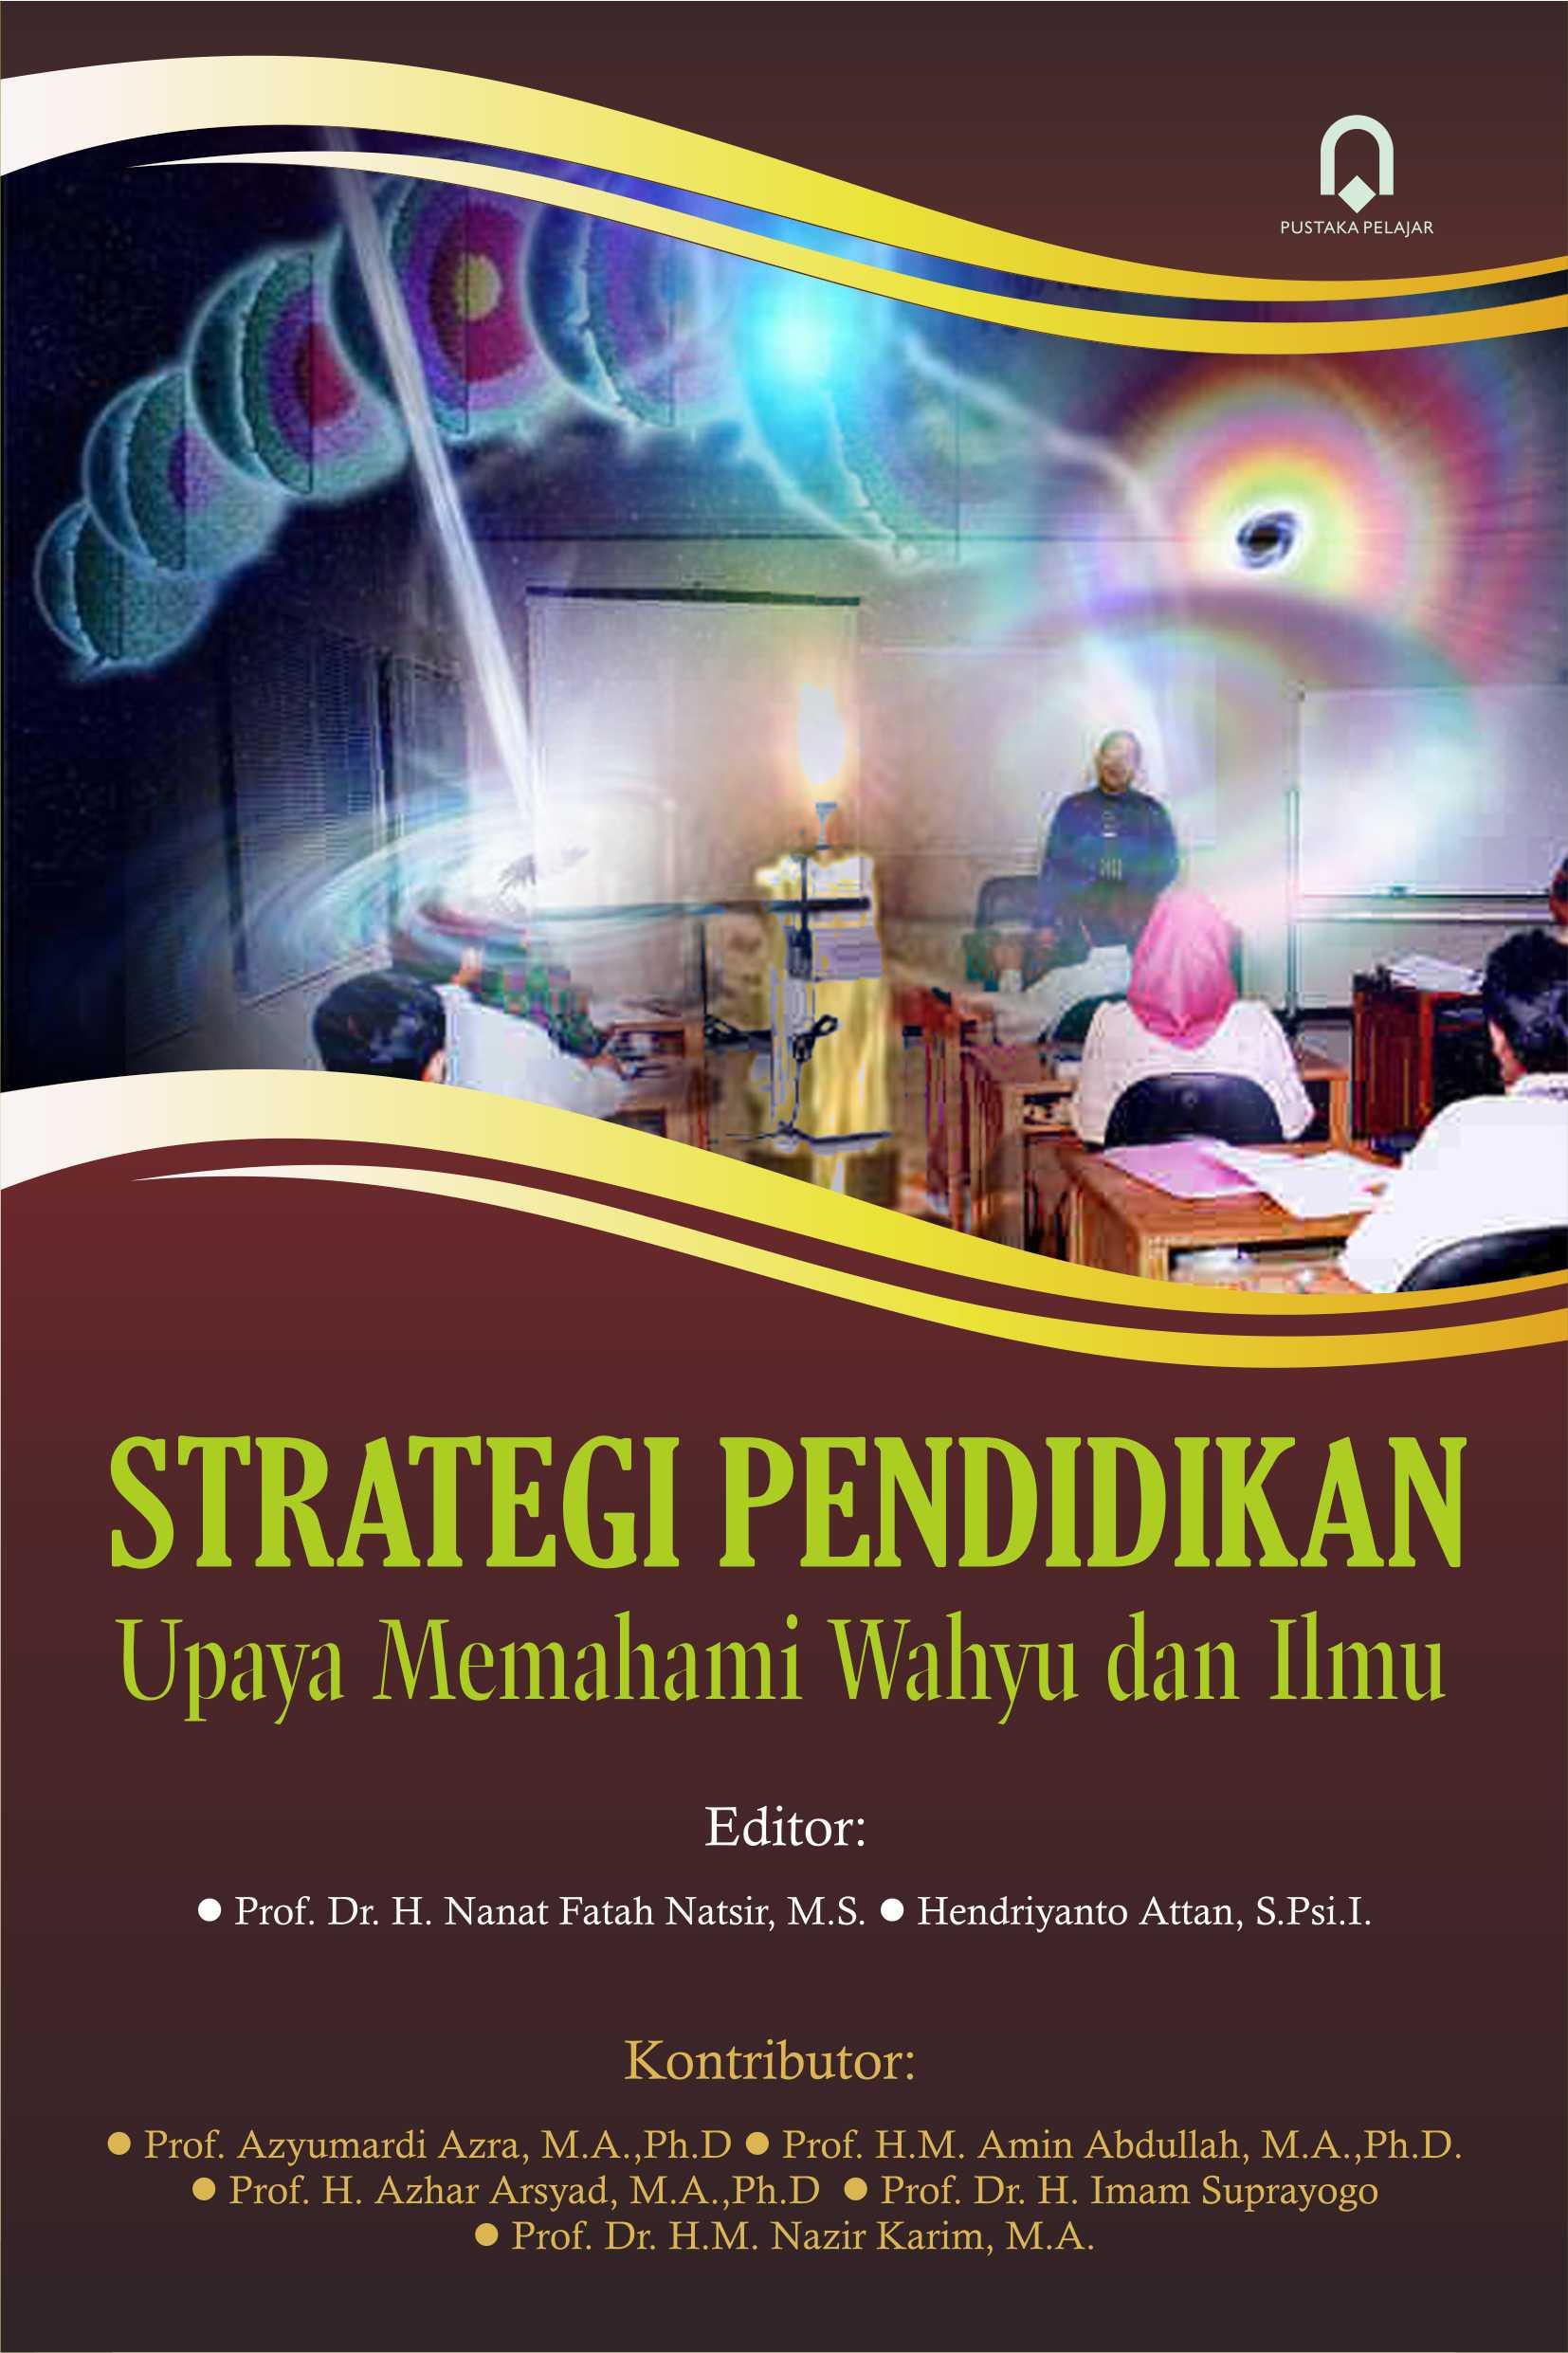 Strategi Pendidikan -Upaya Memahami Wahyu dan Ilmu-